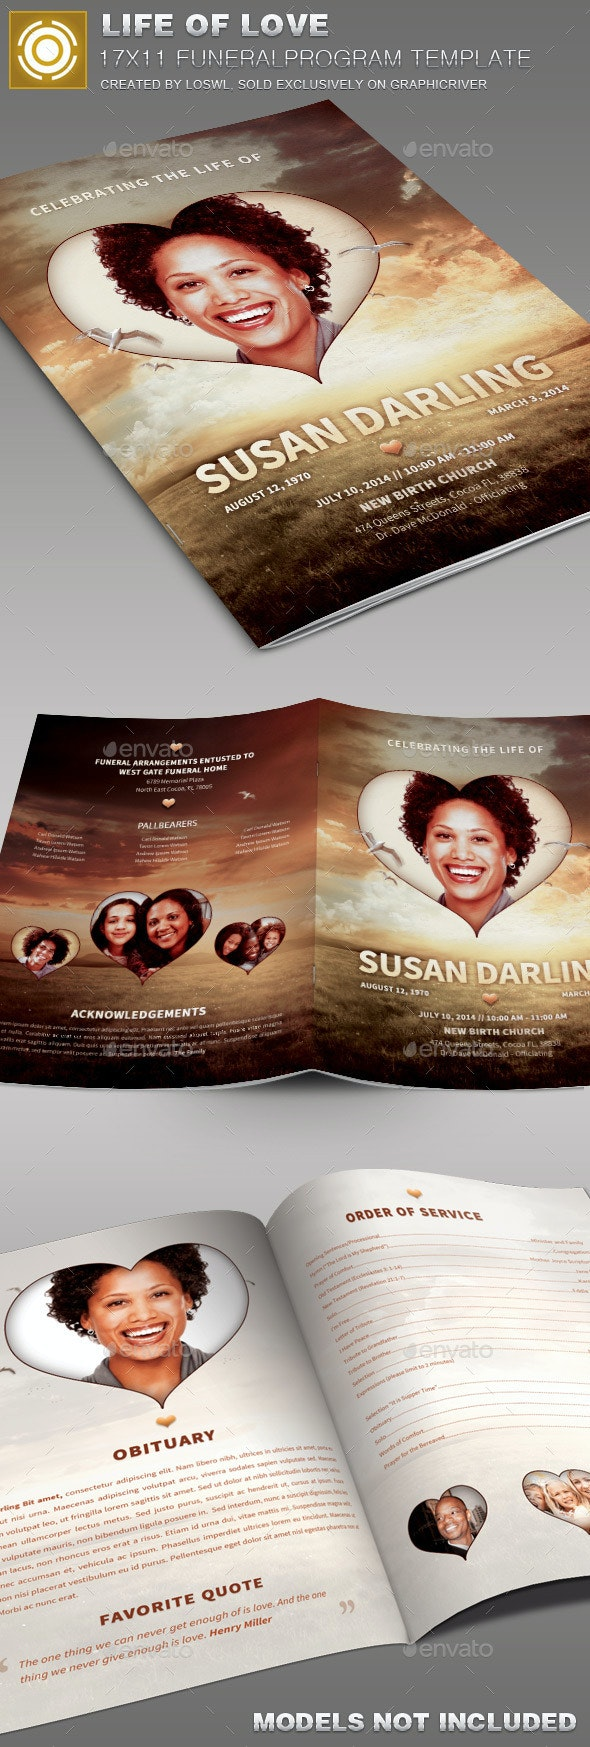 Life of Love Funeral Program Template 006 - Informational Brochures